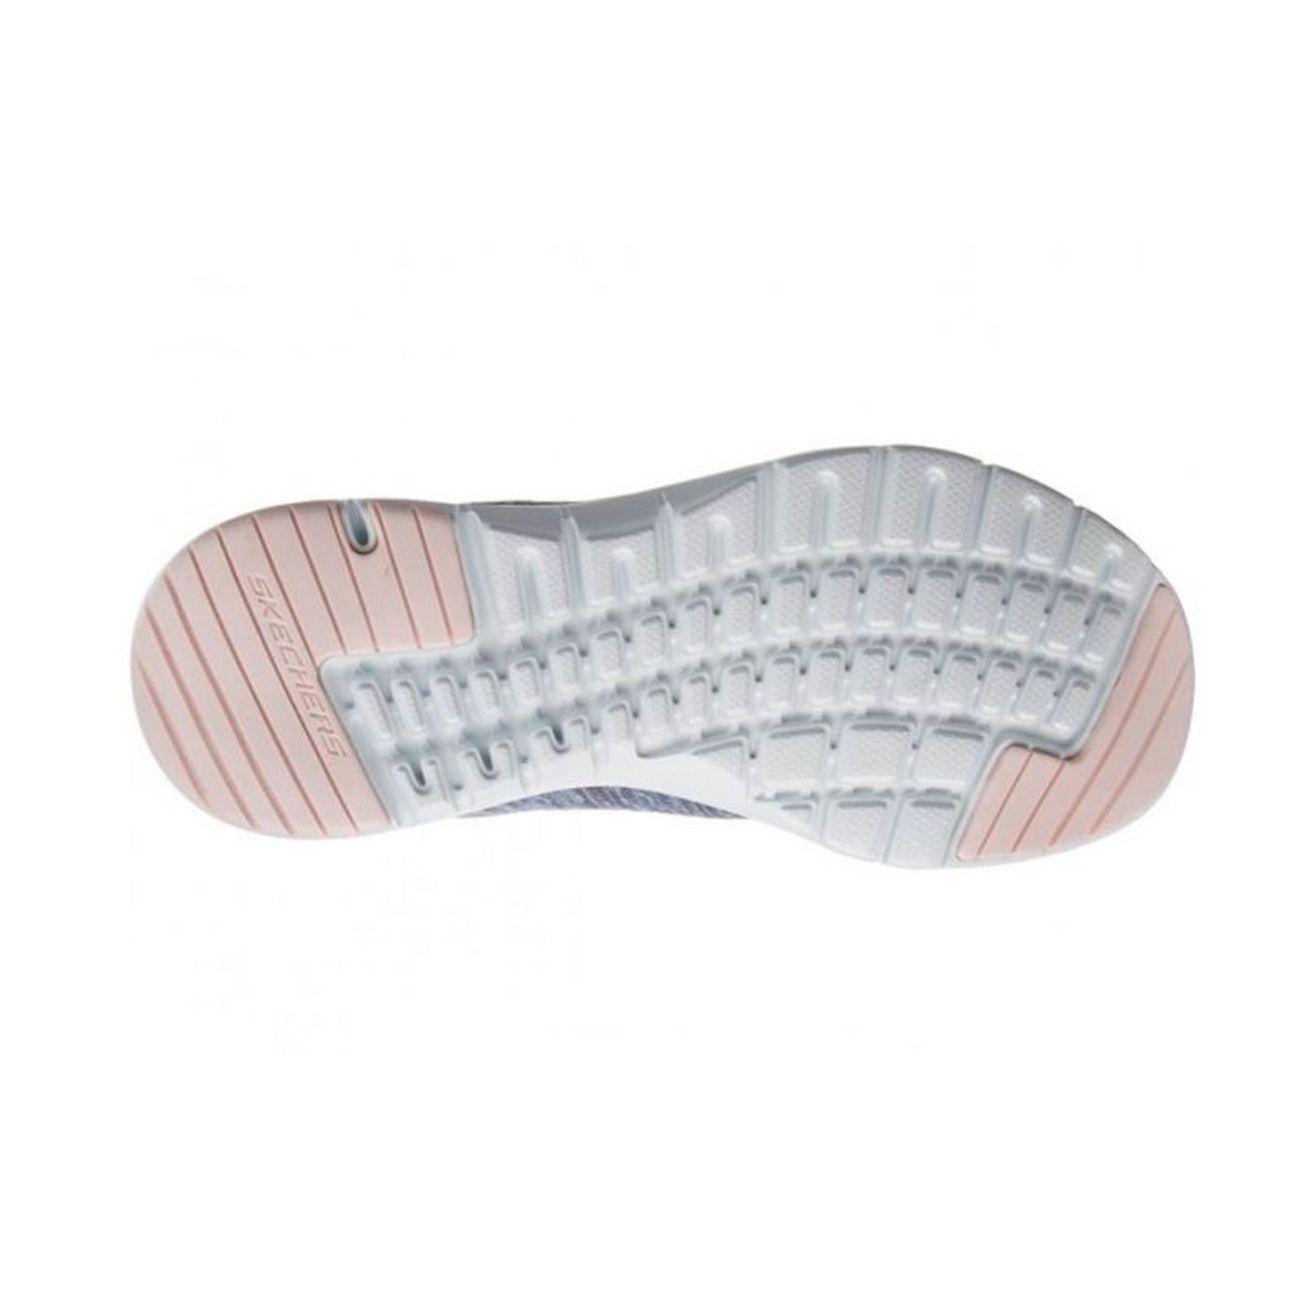 Rose Femme 3 Padel Adulte Gris 0 Sltp Skechers Flex Appeal YD29IEWH